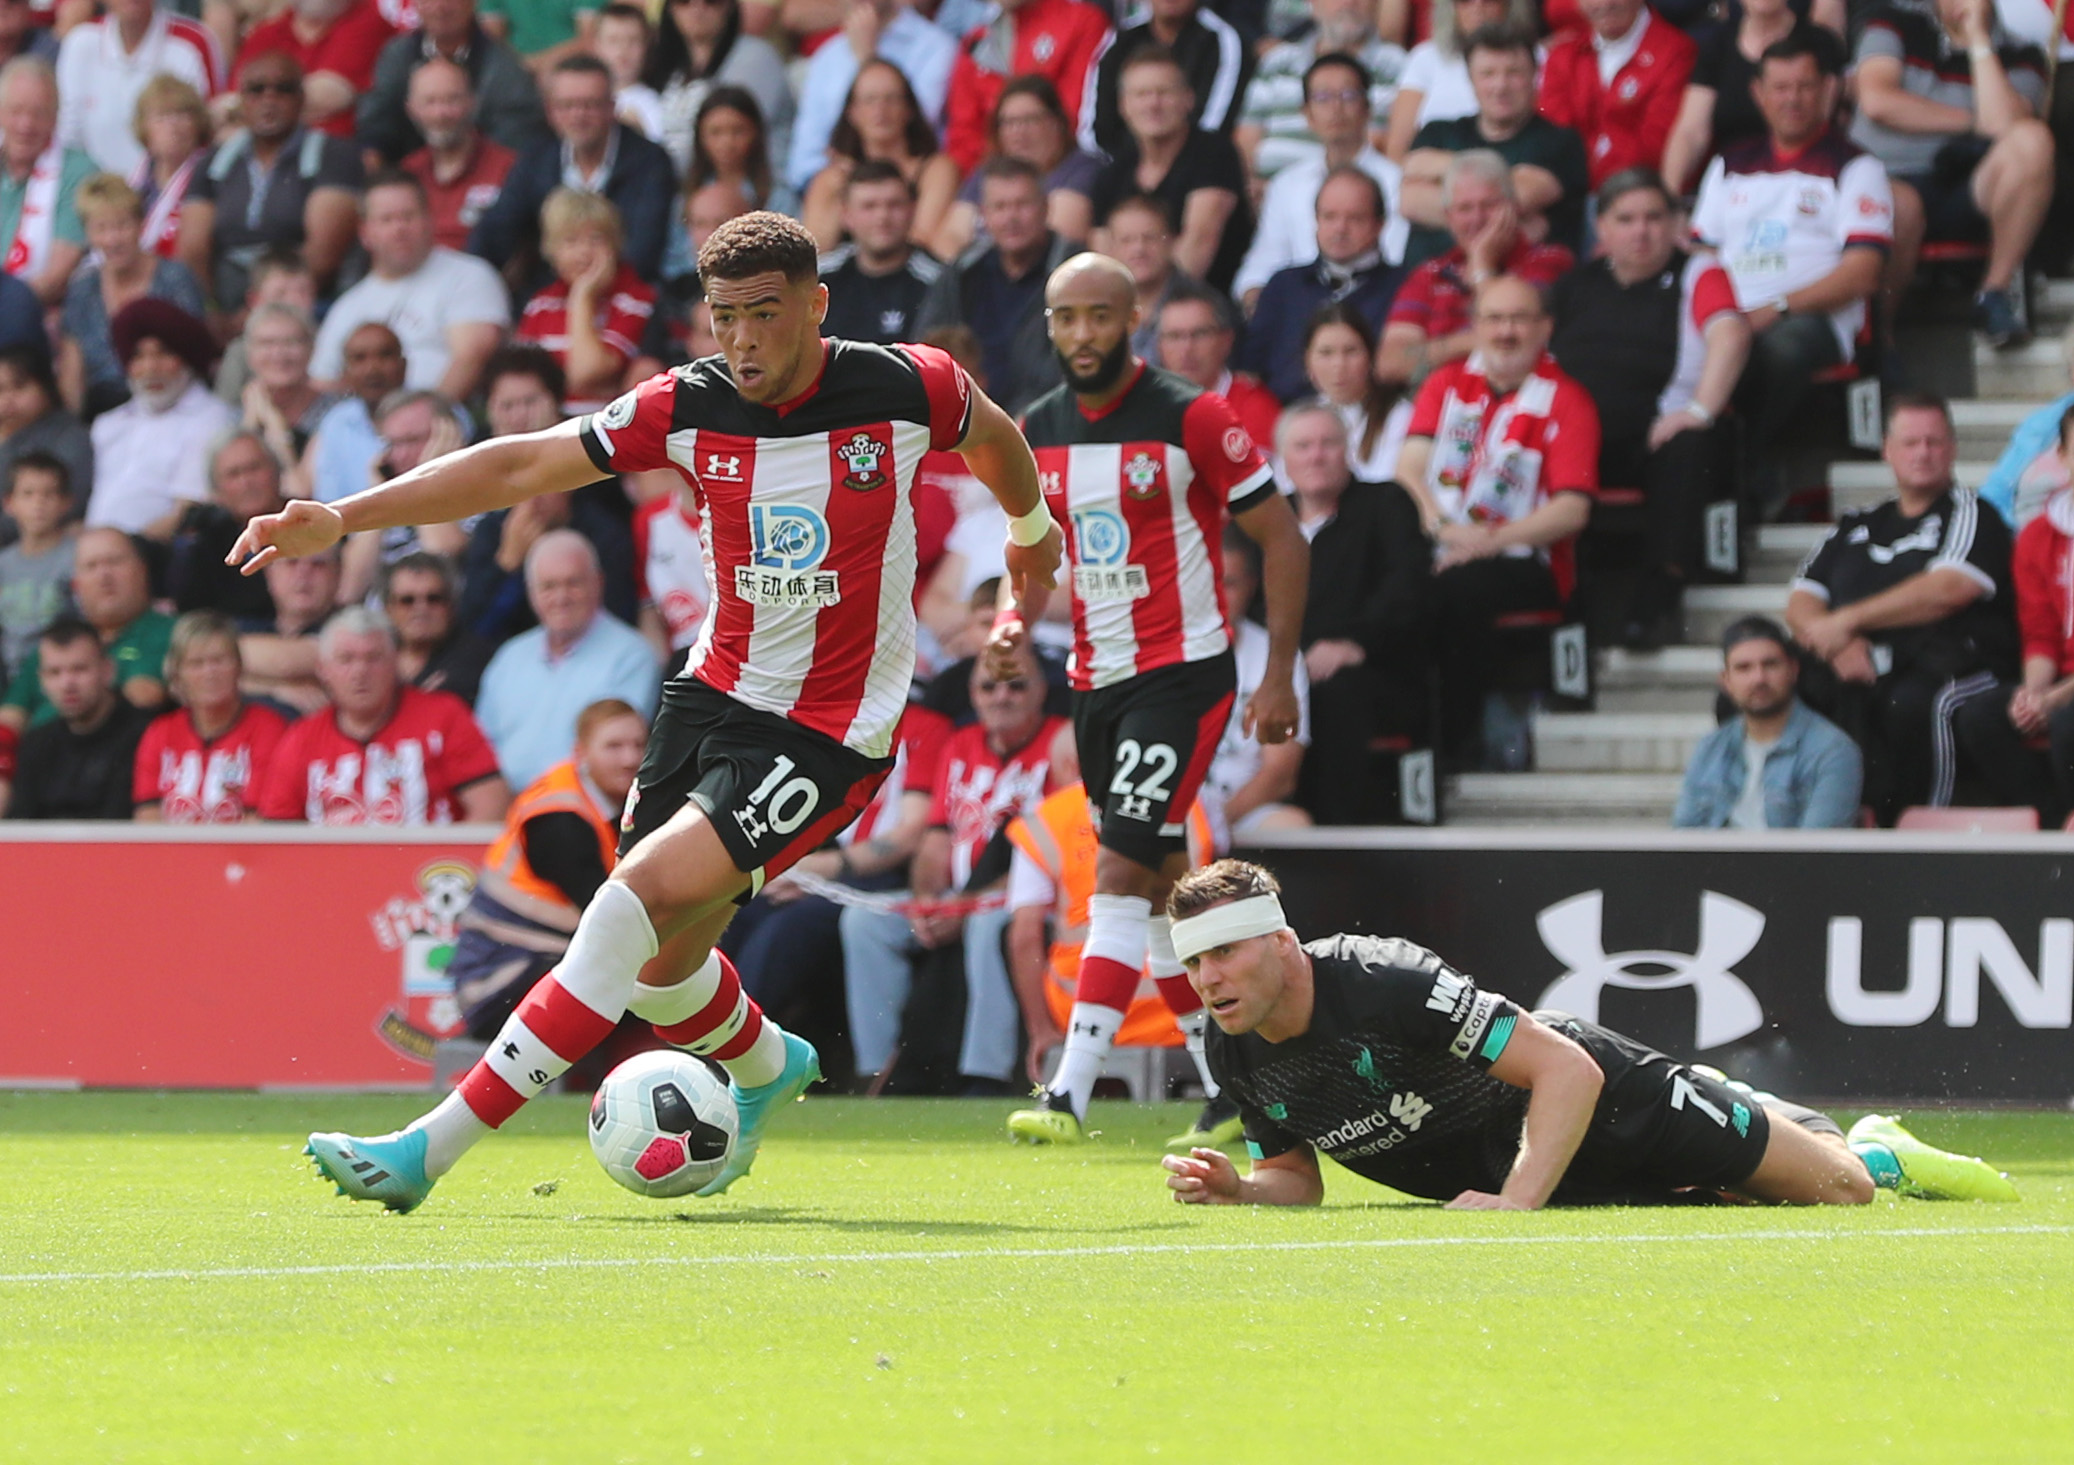 Southampton manager Ralph Hasenhuttl backs striker Che Adams